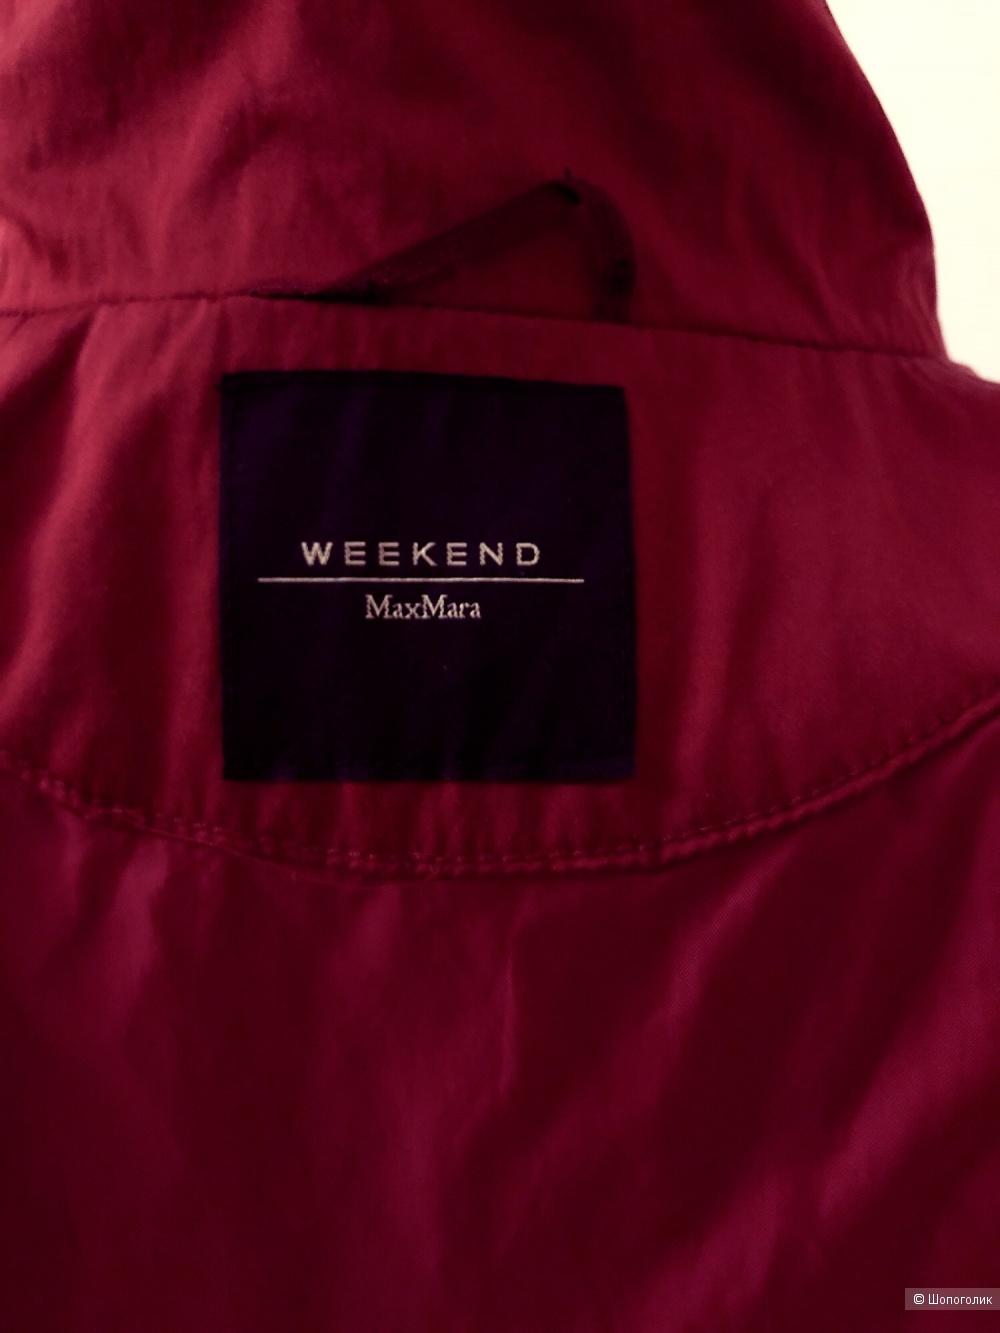 Жакет max mara weekend размер 44-46